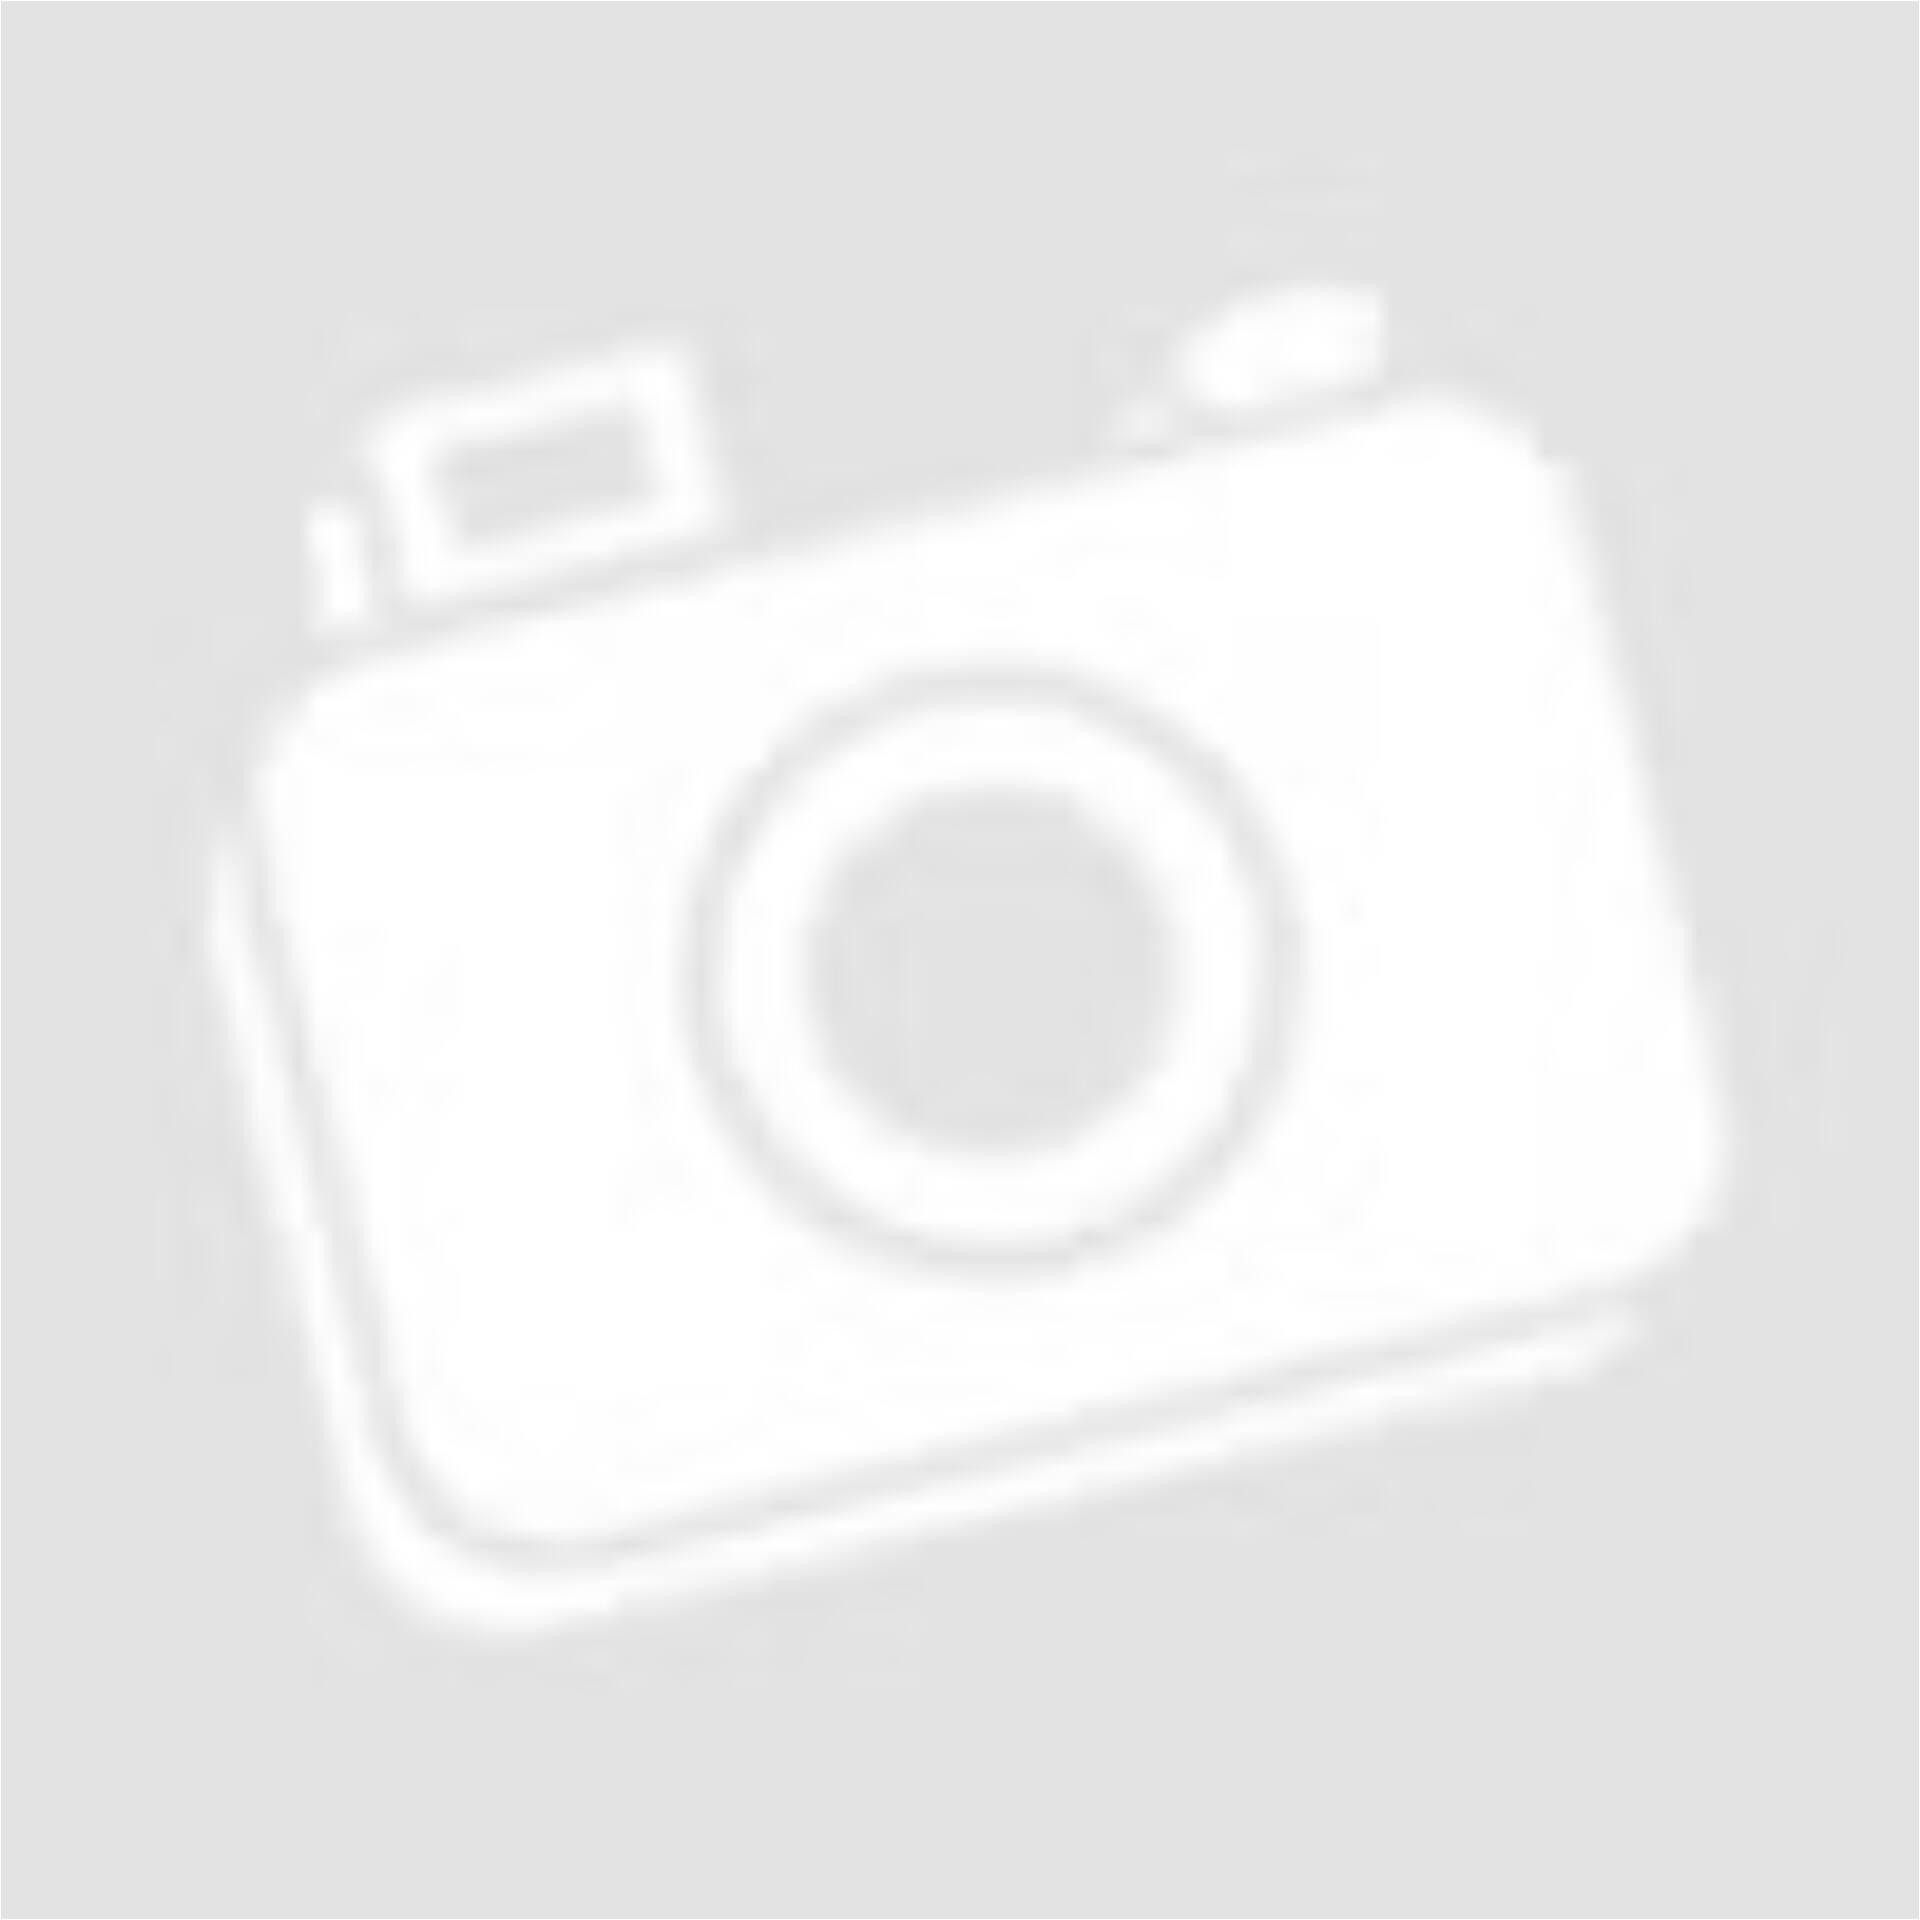 b2cf1a0596 Tom Tailor fehér-kék csíkos ing (Méret: 12év (152)) - Fiú felső ...